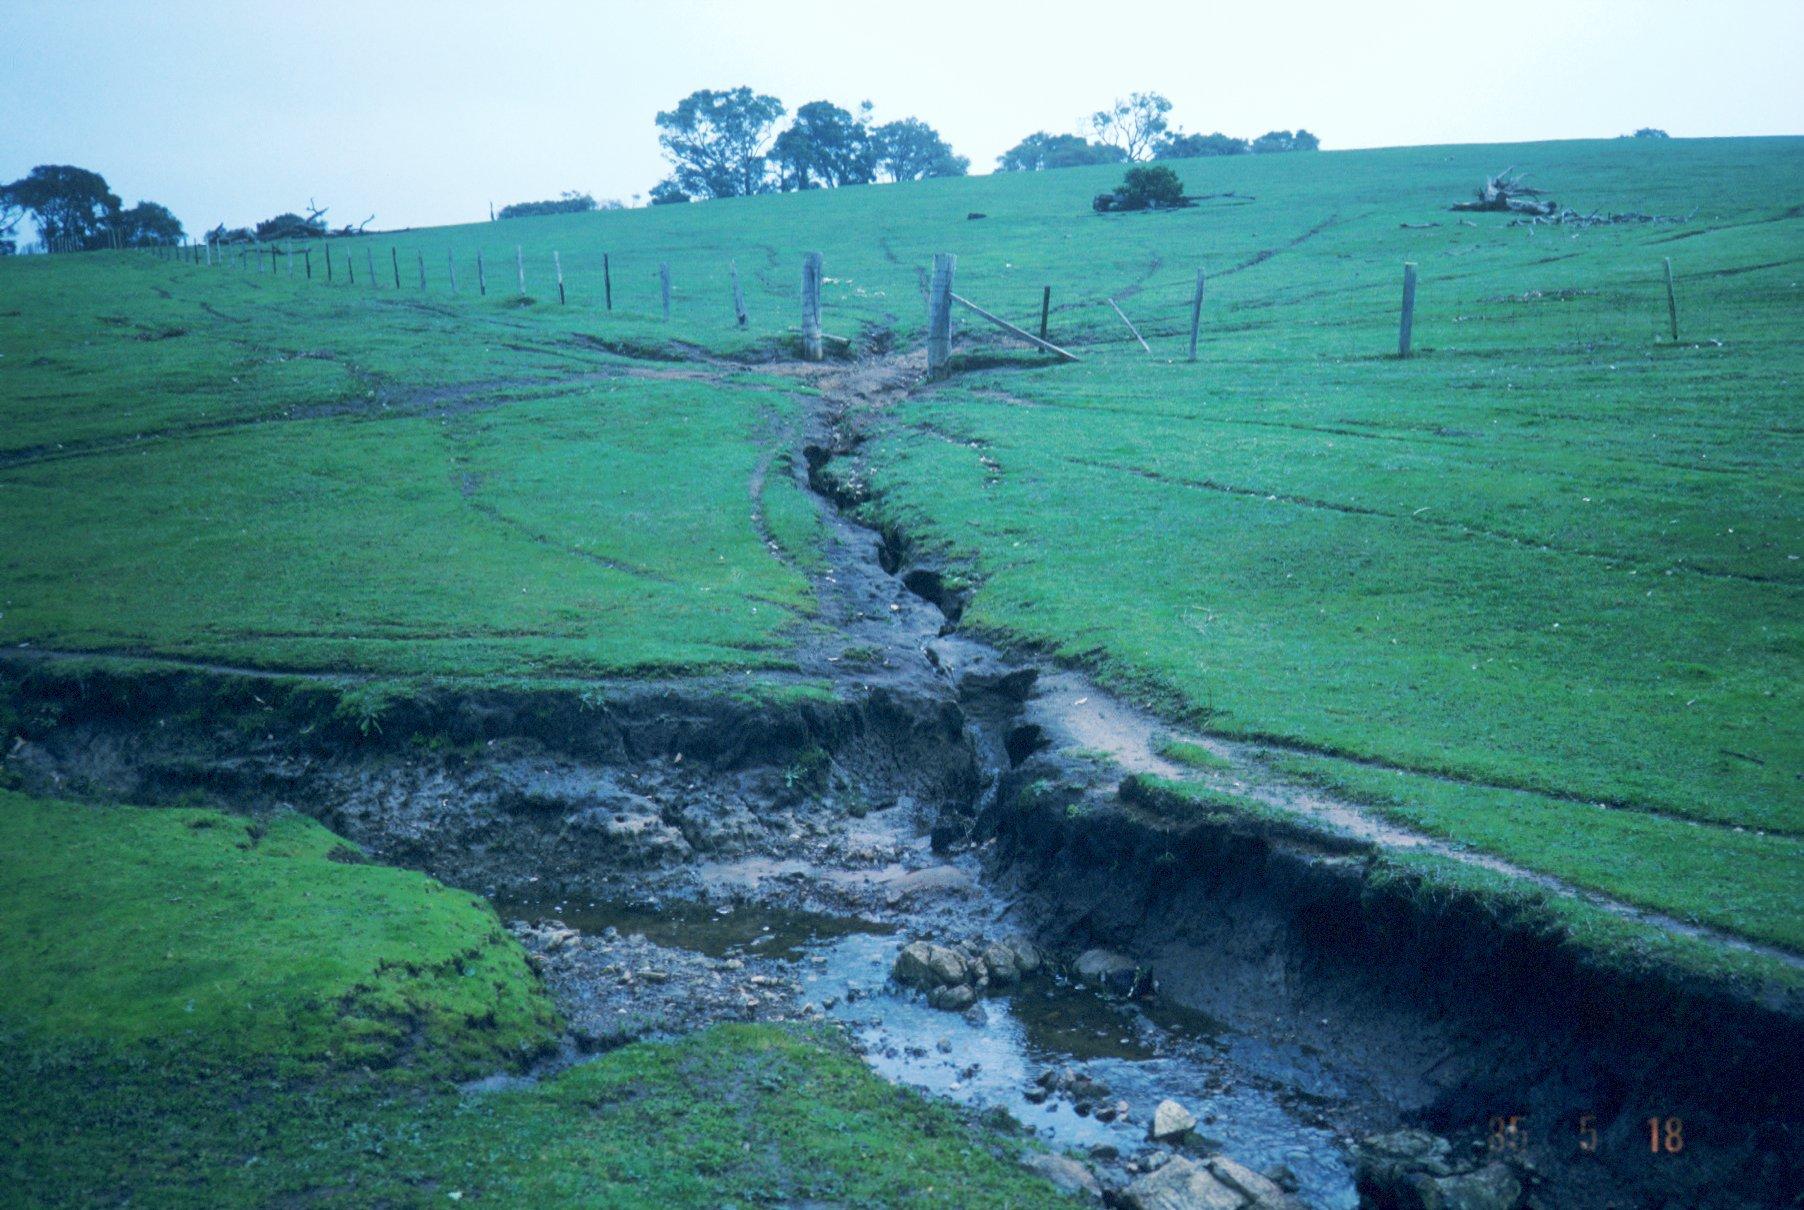 Water erosion of paddock